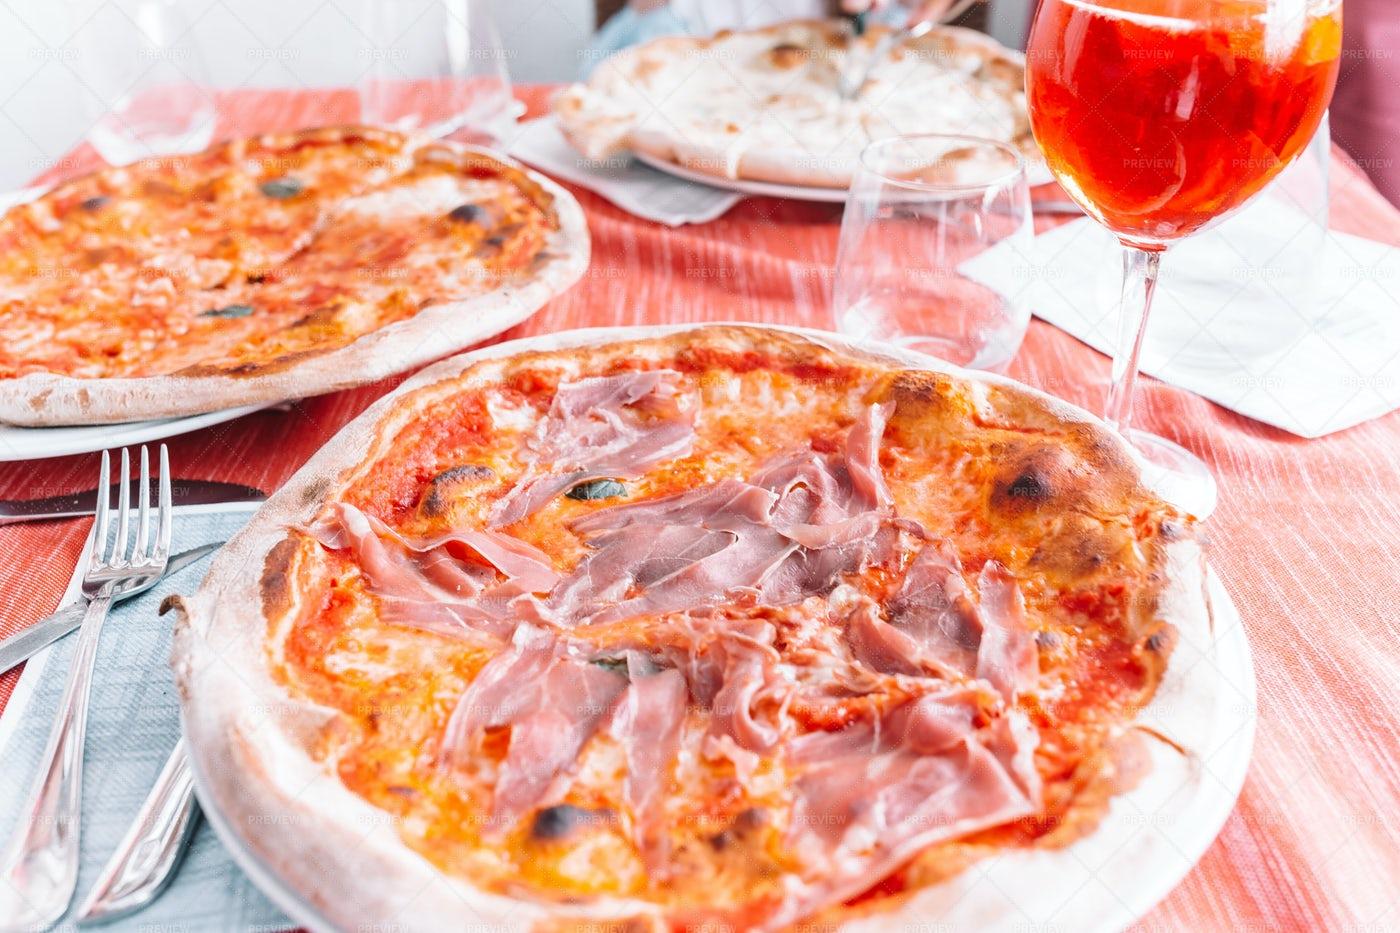 Fresh Pizza Dinner: Stock Photos